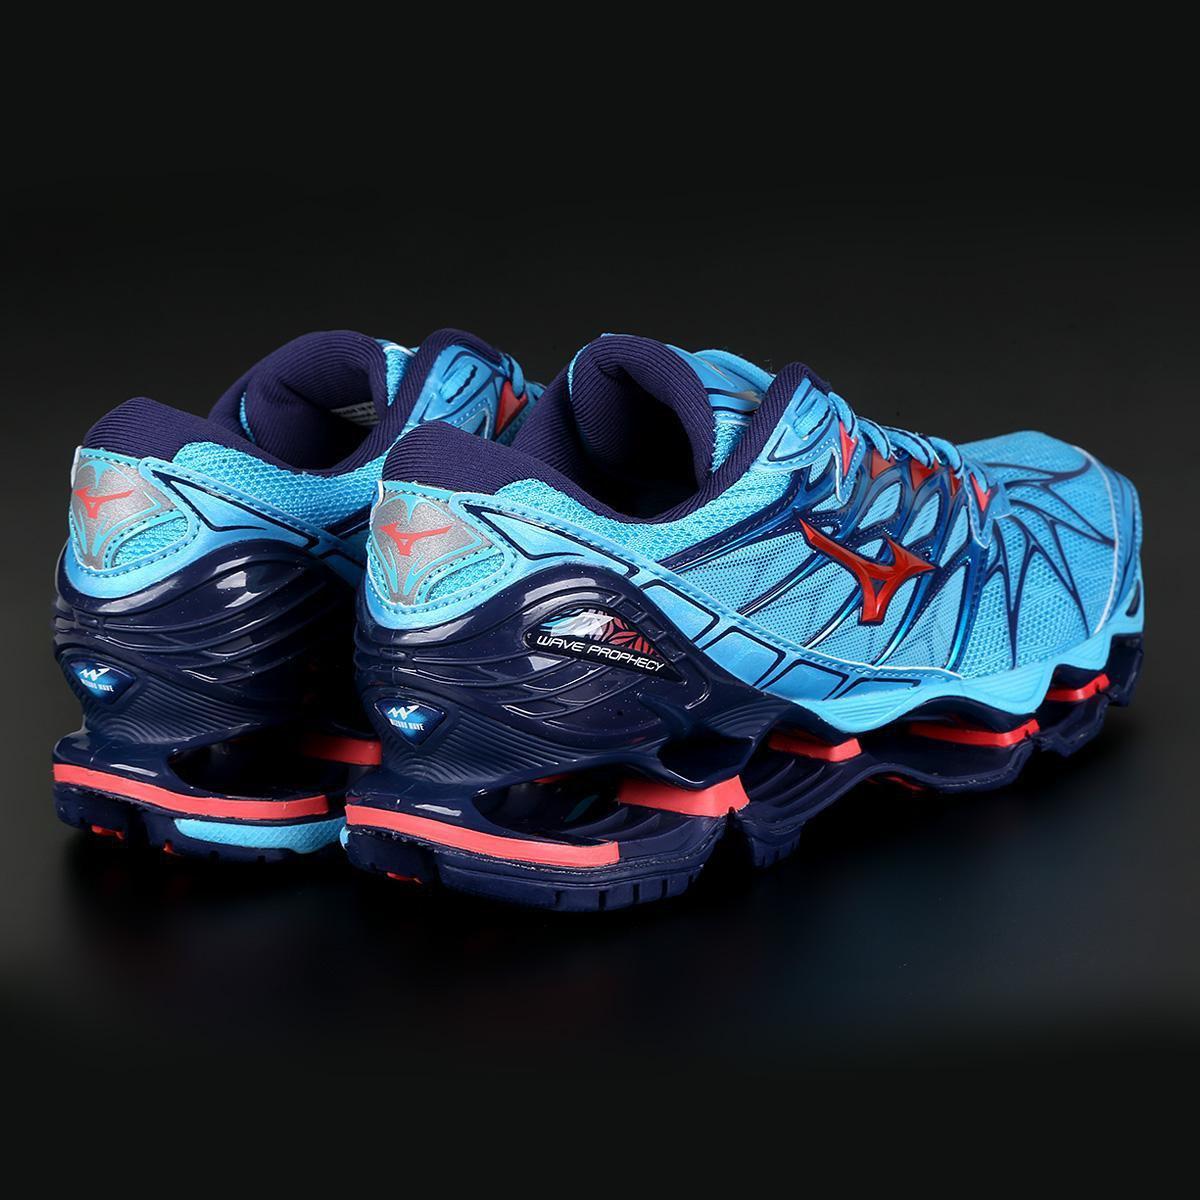 ad027eacd2 Tênis Mizuno Wave Prophecy 7 Feminino - Azul e Rosa - Compre Agora ...